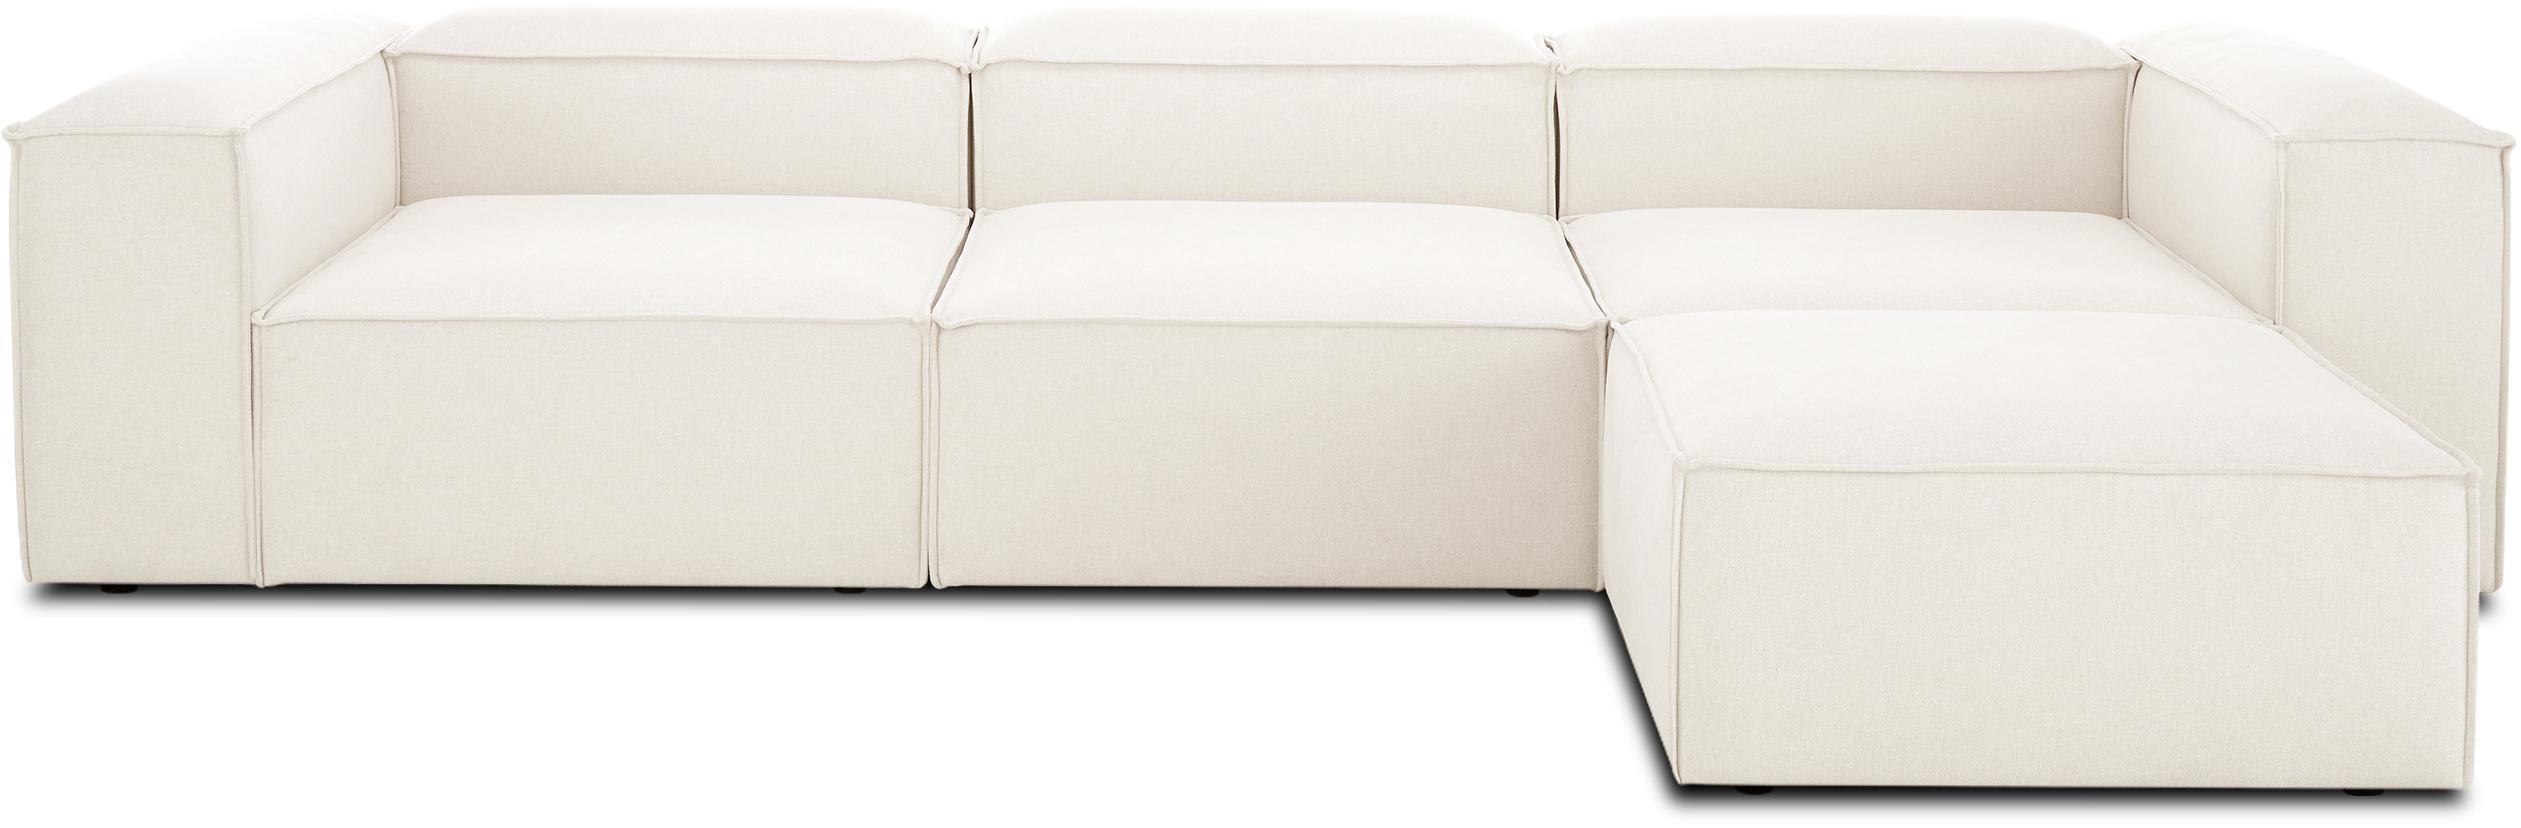 Modulares Ecksofa Lennon, Bezug: Polyester Der hochwertige, Gestell: Massives Kiefernholz, Spe, Webstoff Beige, B 326 x T 207 cm